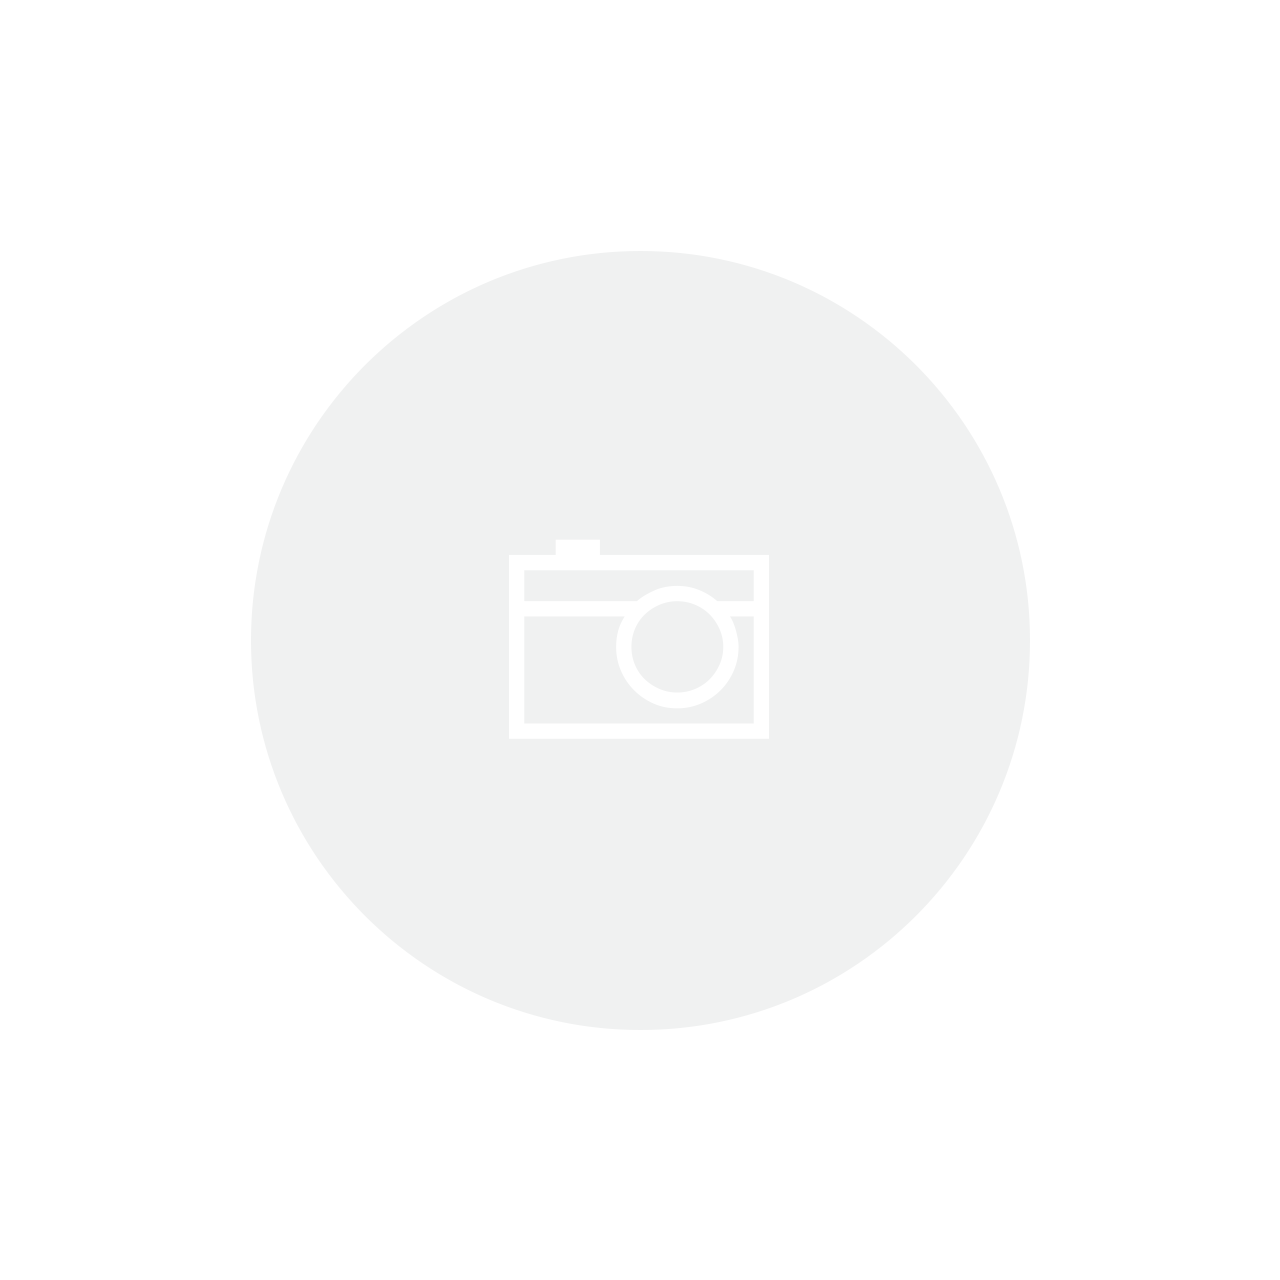 CADEIRINHA THULE FRONT. RIDE ALONG MINI 5 S (100105).